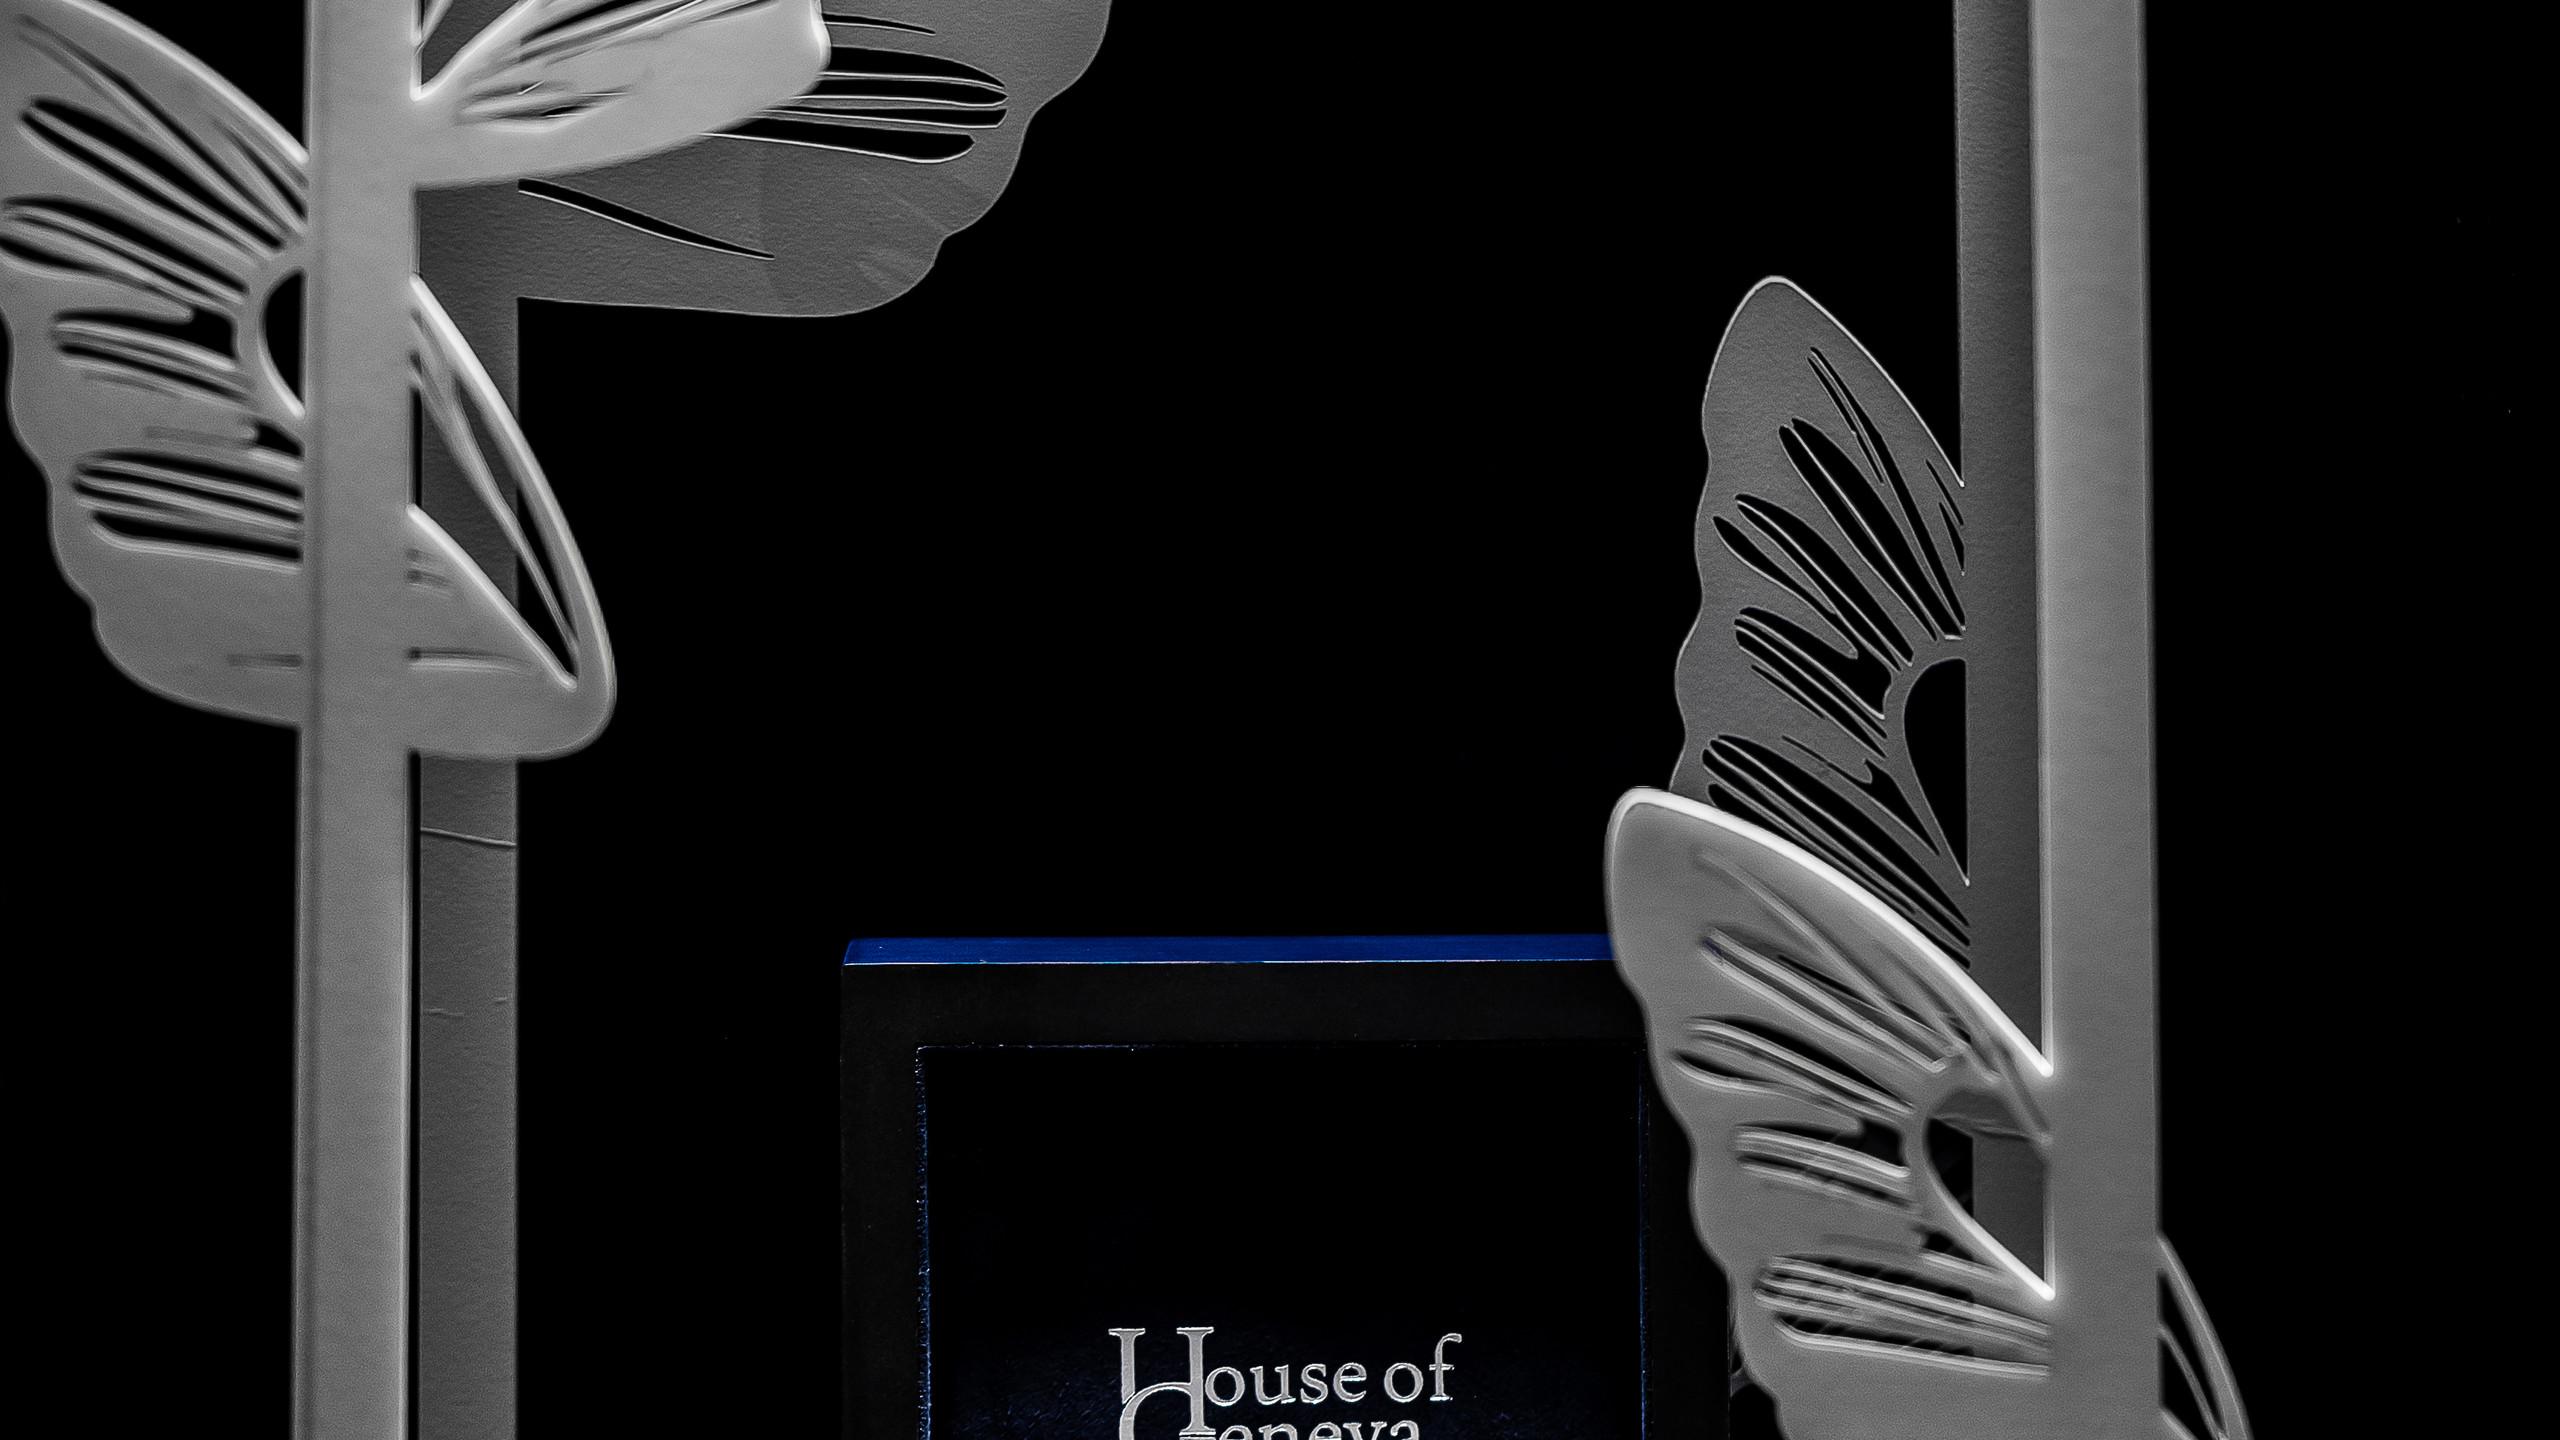 House of Geneva's Blue Isabellae display.